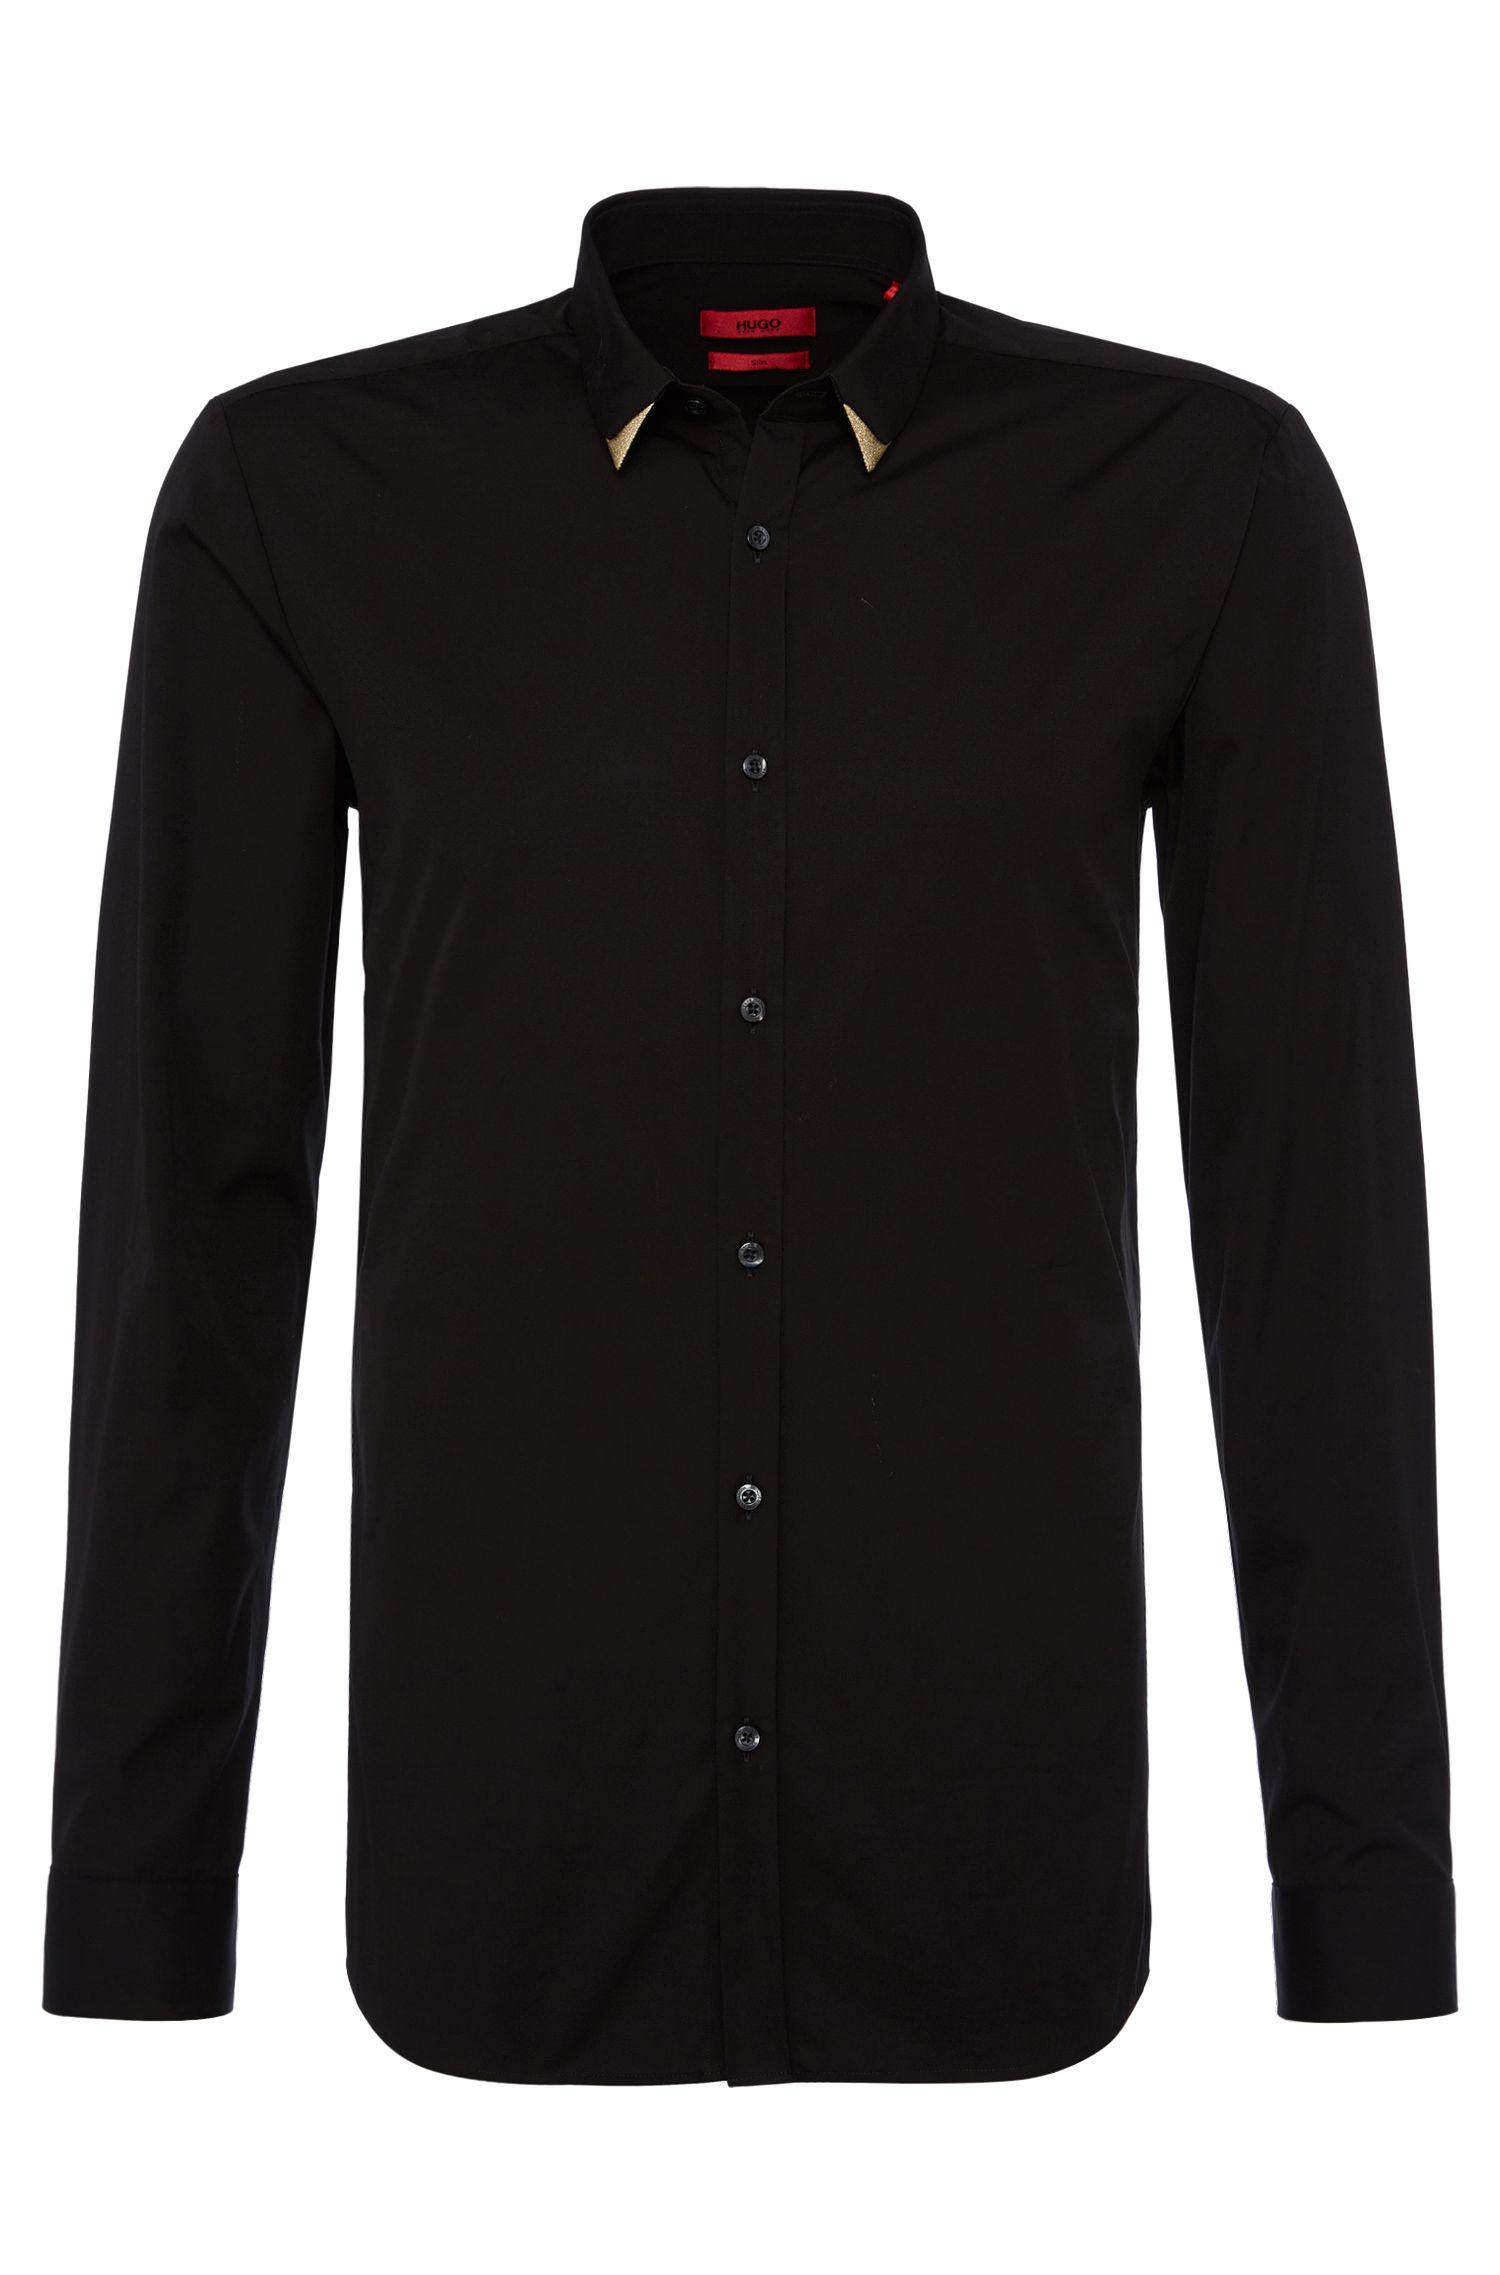 'Erulf'   Slim Fit, Cotton Tipped Collar Button Down Shirt